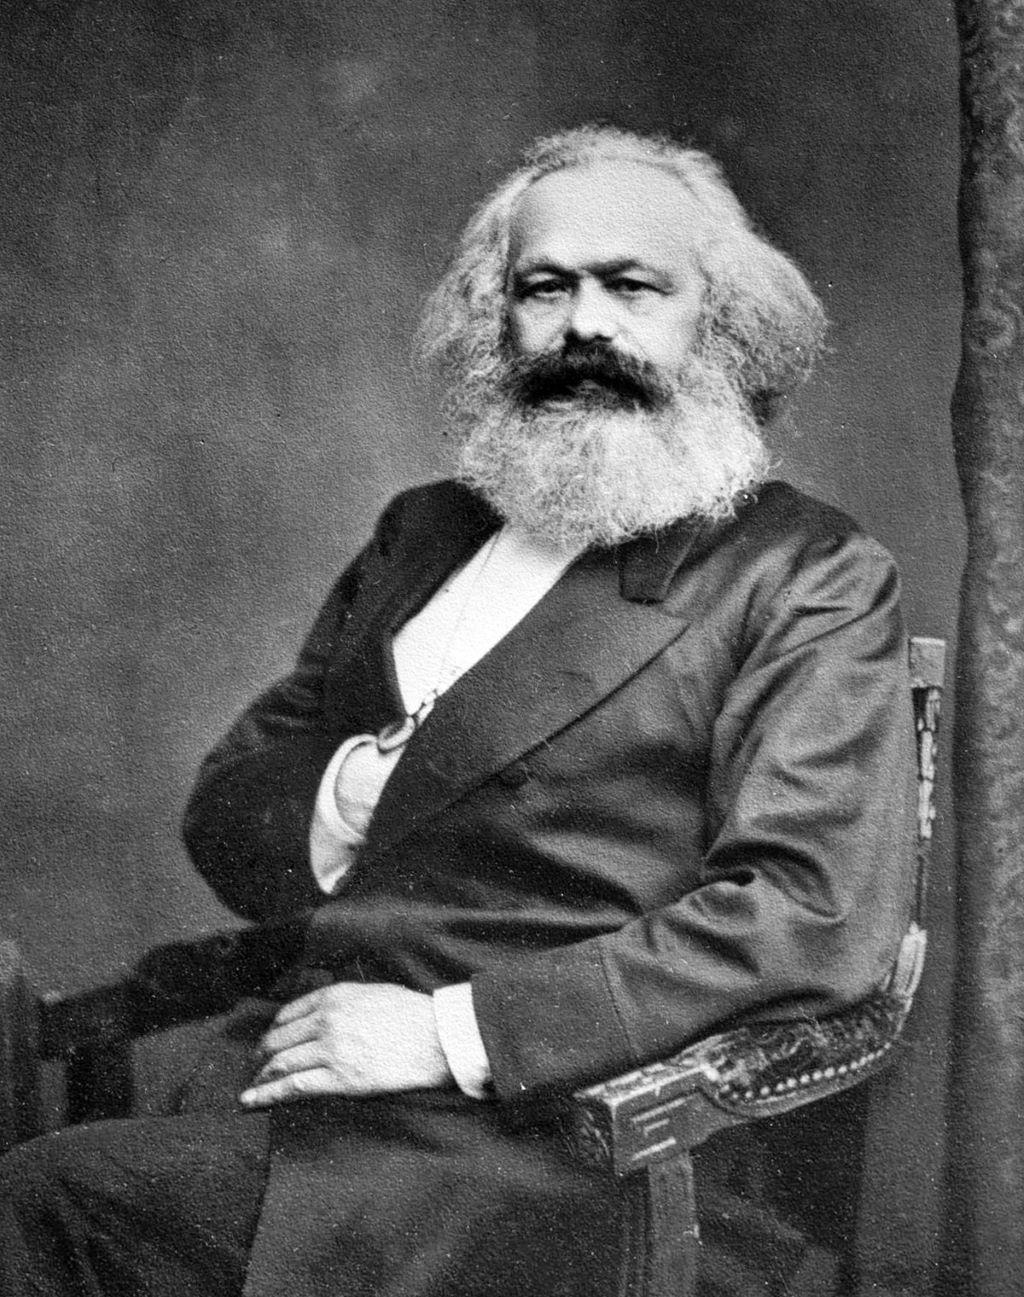 1200px-Karl_Marx_001.jpg